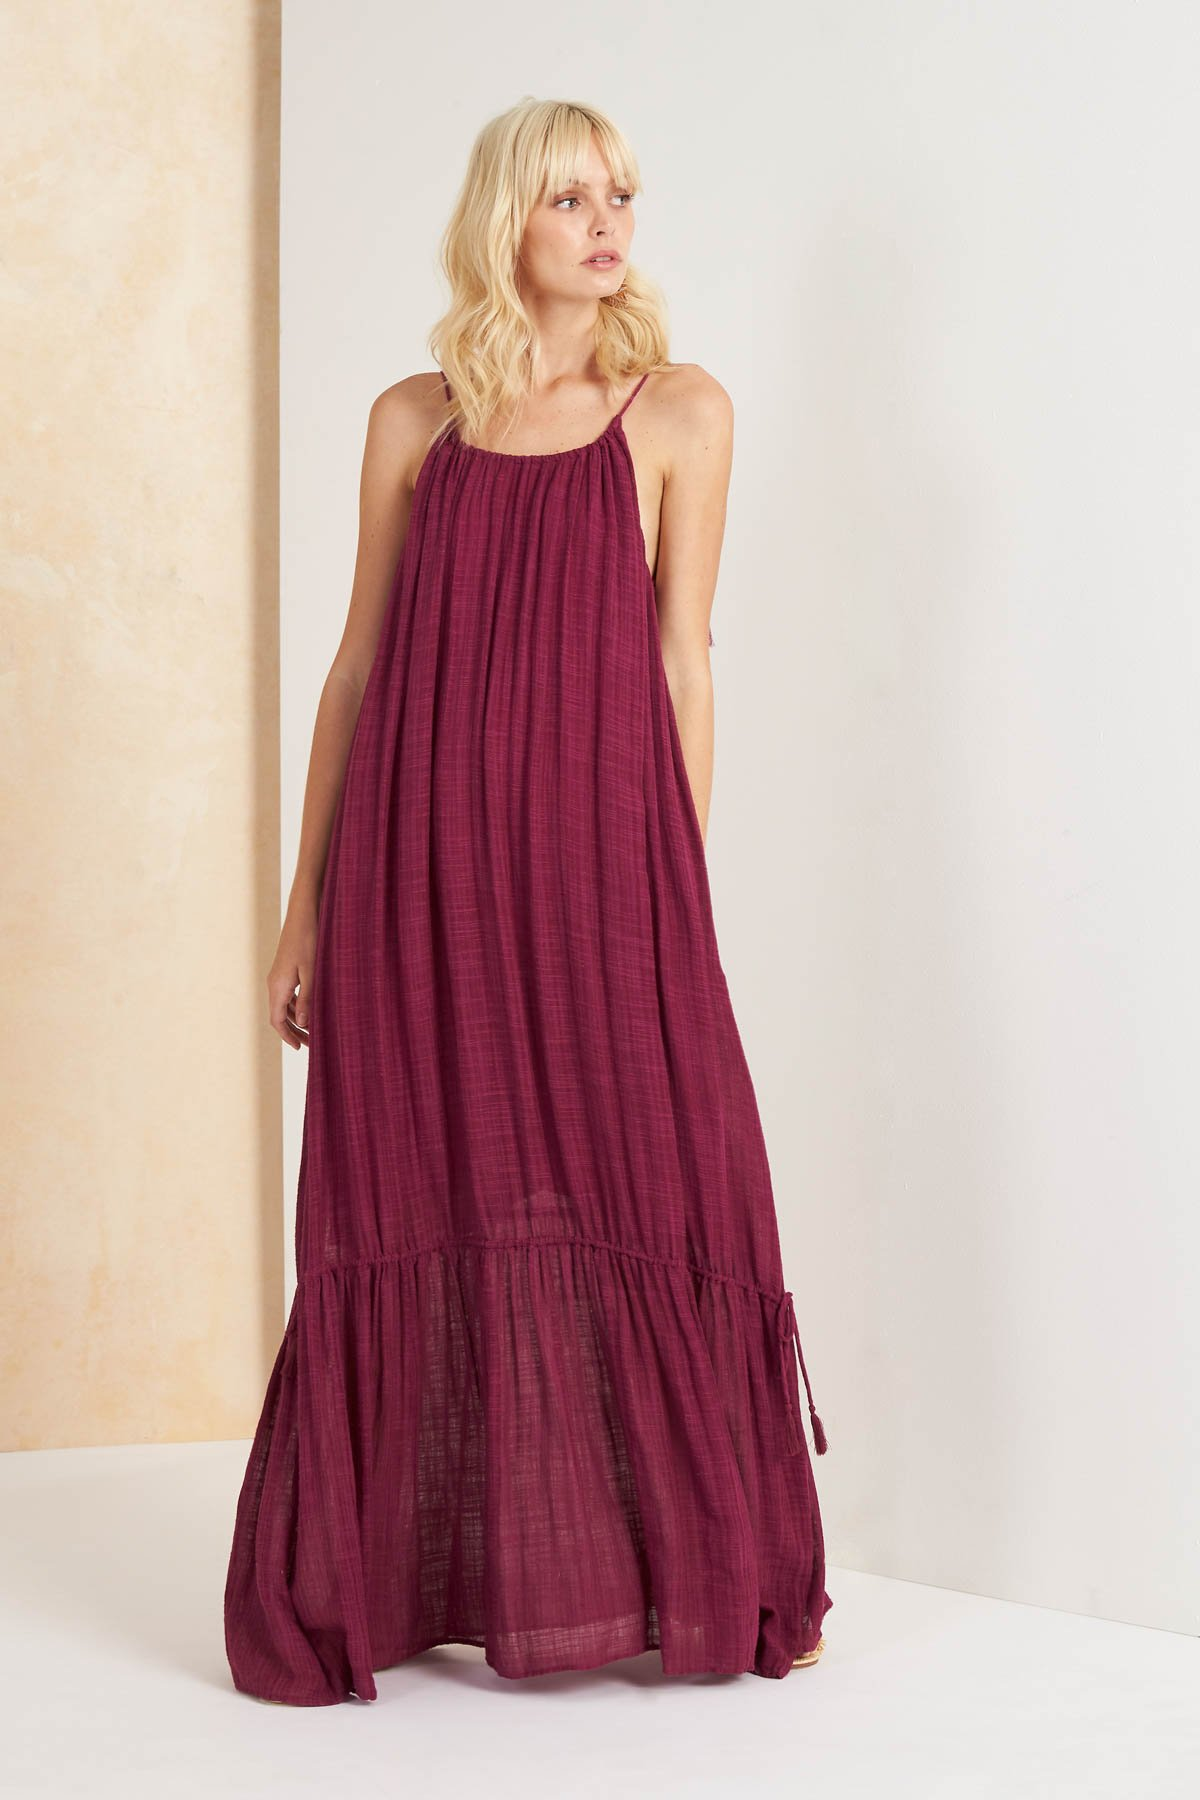 Image of Paradalis Maxi Dress - Magenta